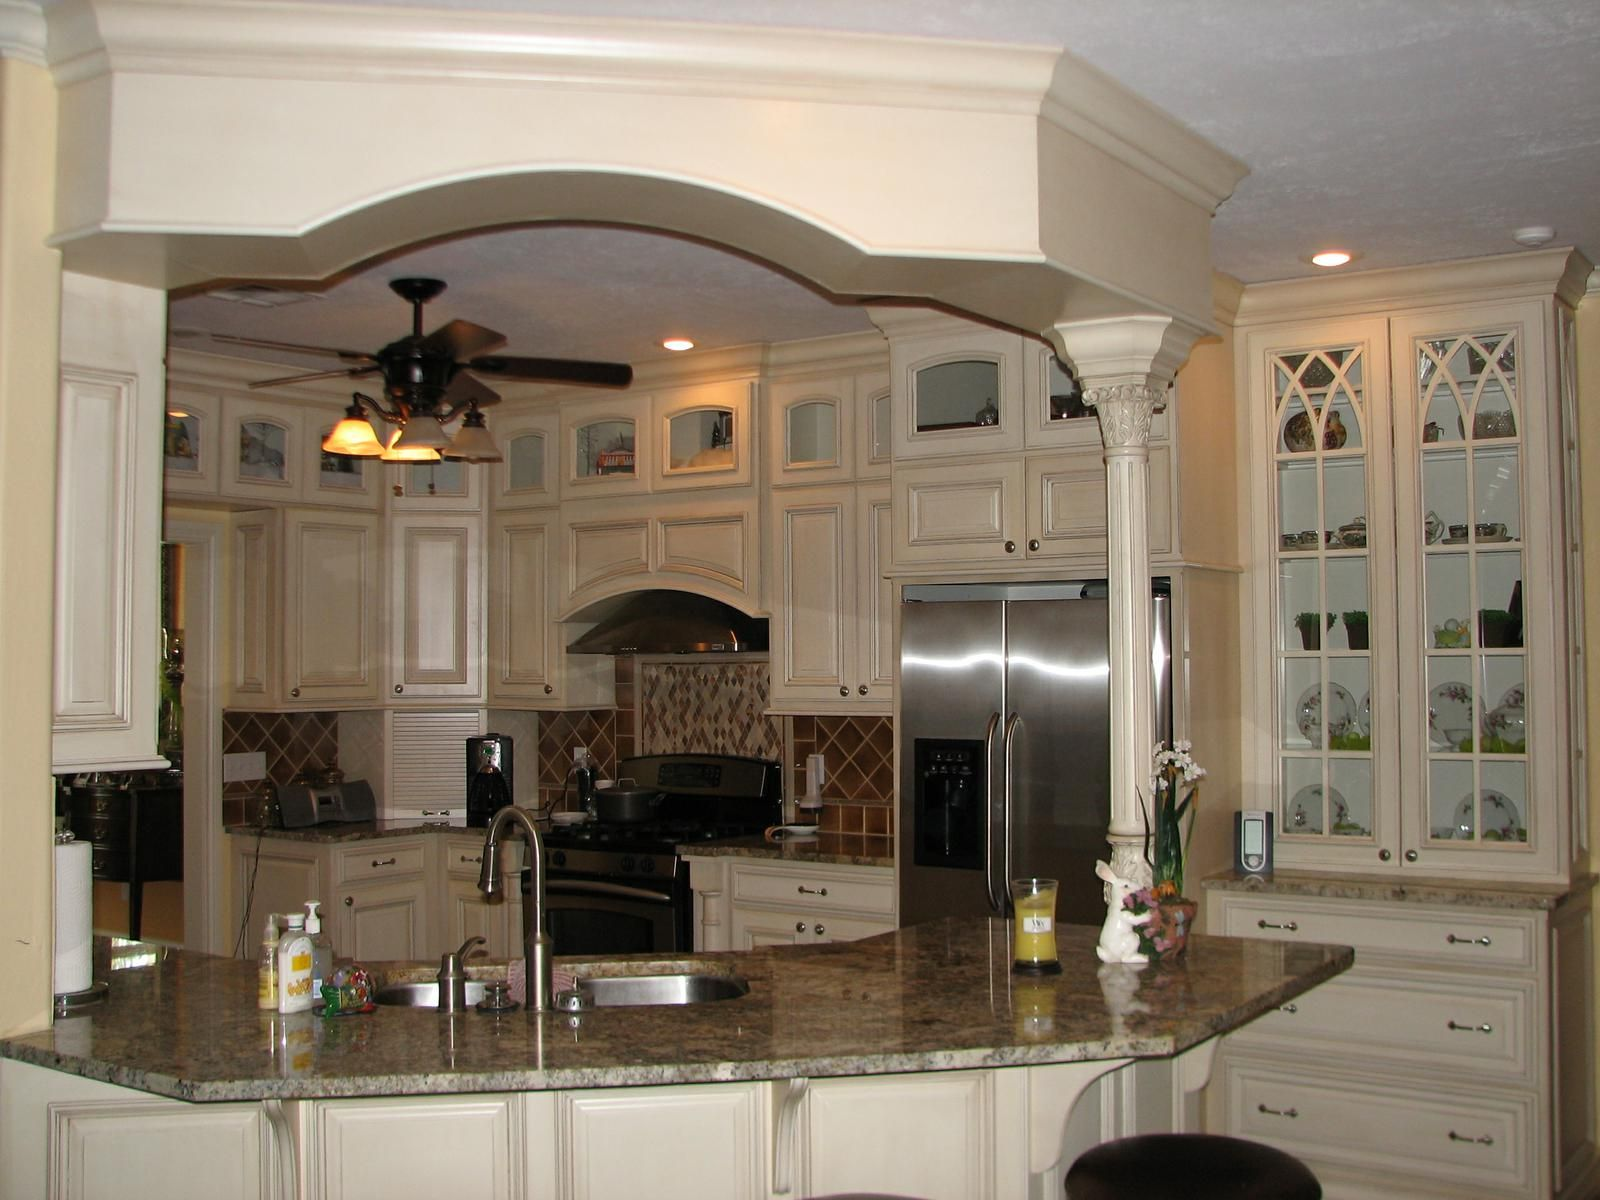 Custom Glazed Kitchen Cabinets Custom Painted And Glazed Kitchenrhodes Woodworking